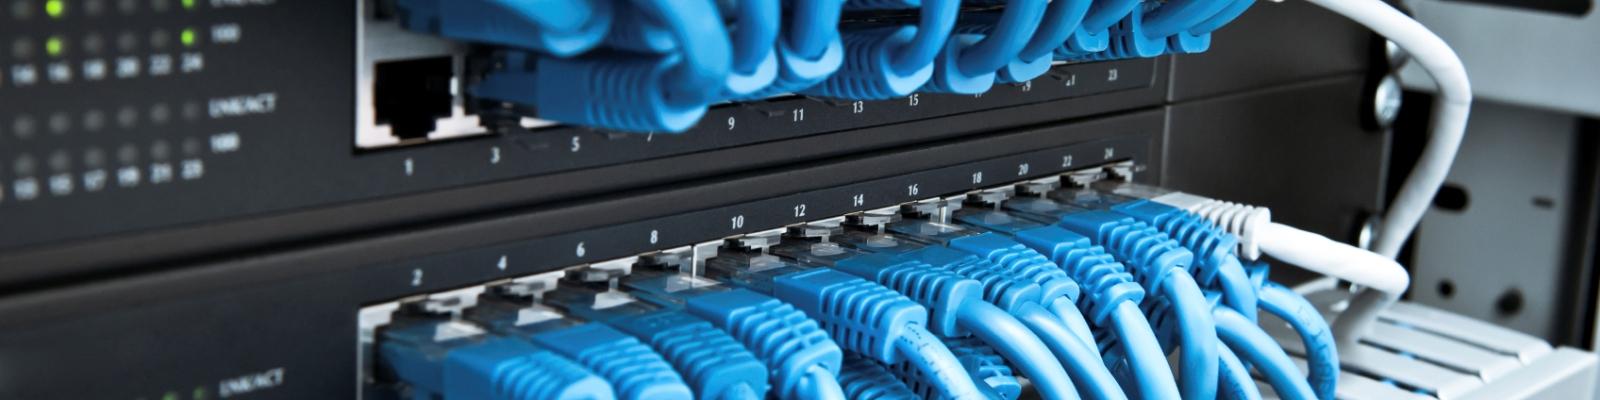 Innovative Companies Network Systems